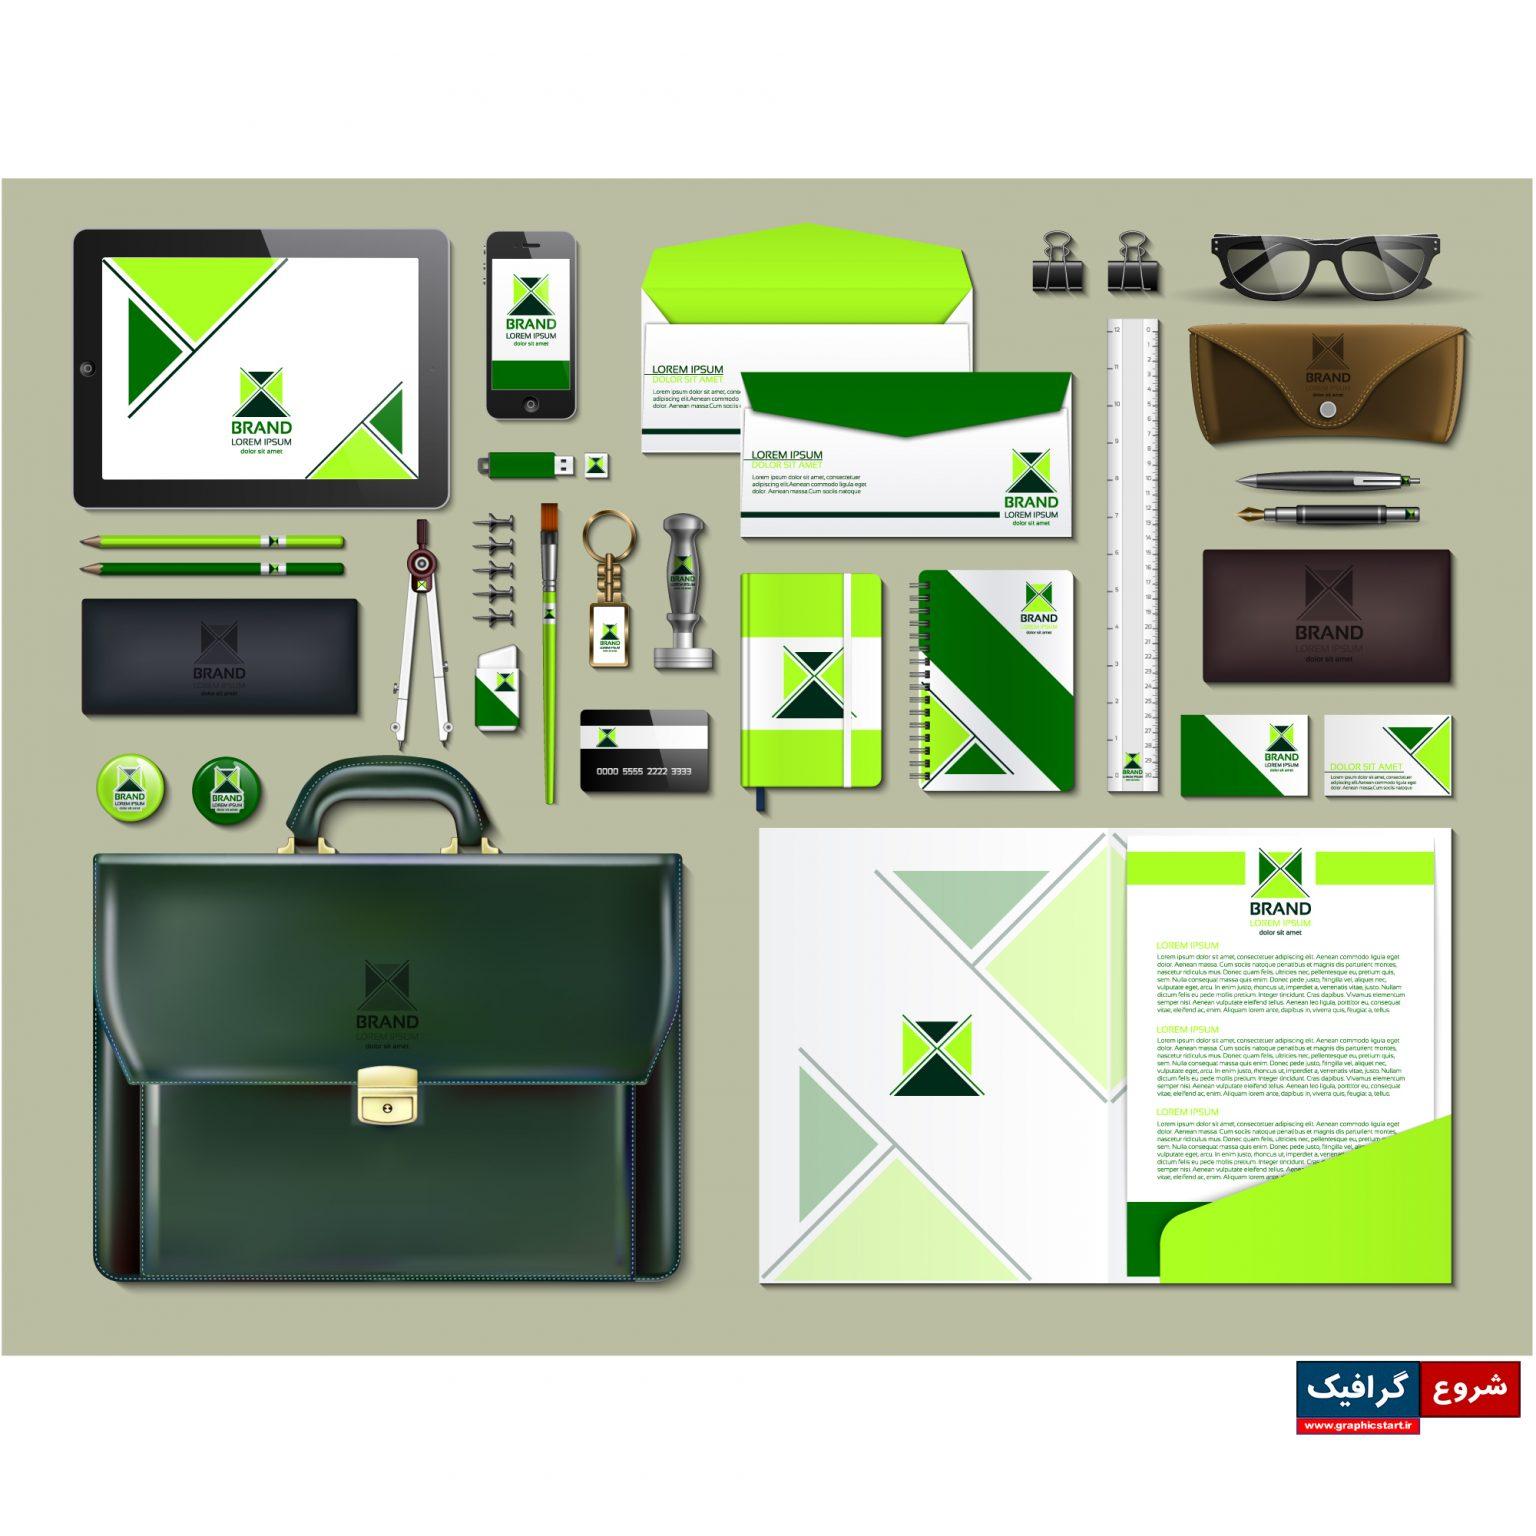 دانلود وکتور پکیج لوازم التحریر تجاری با طرح سبز